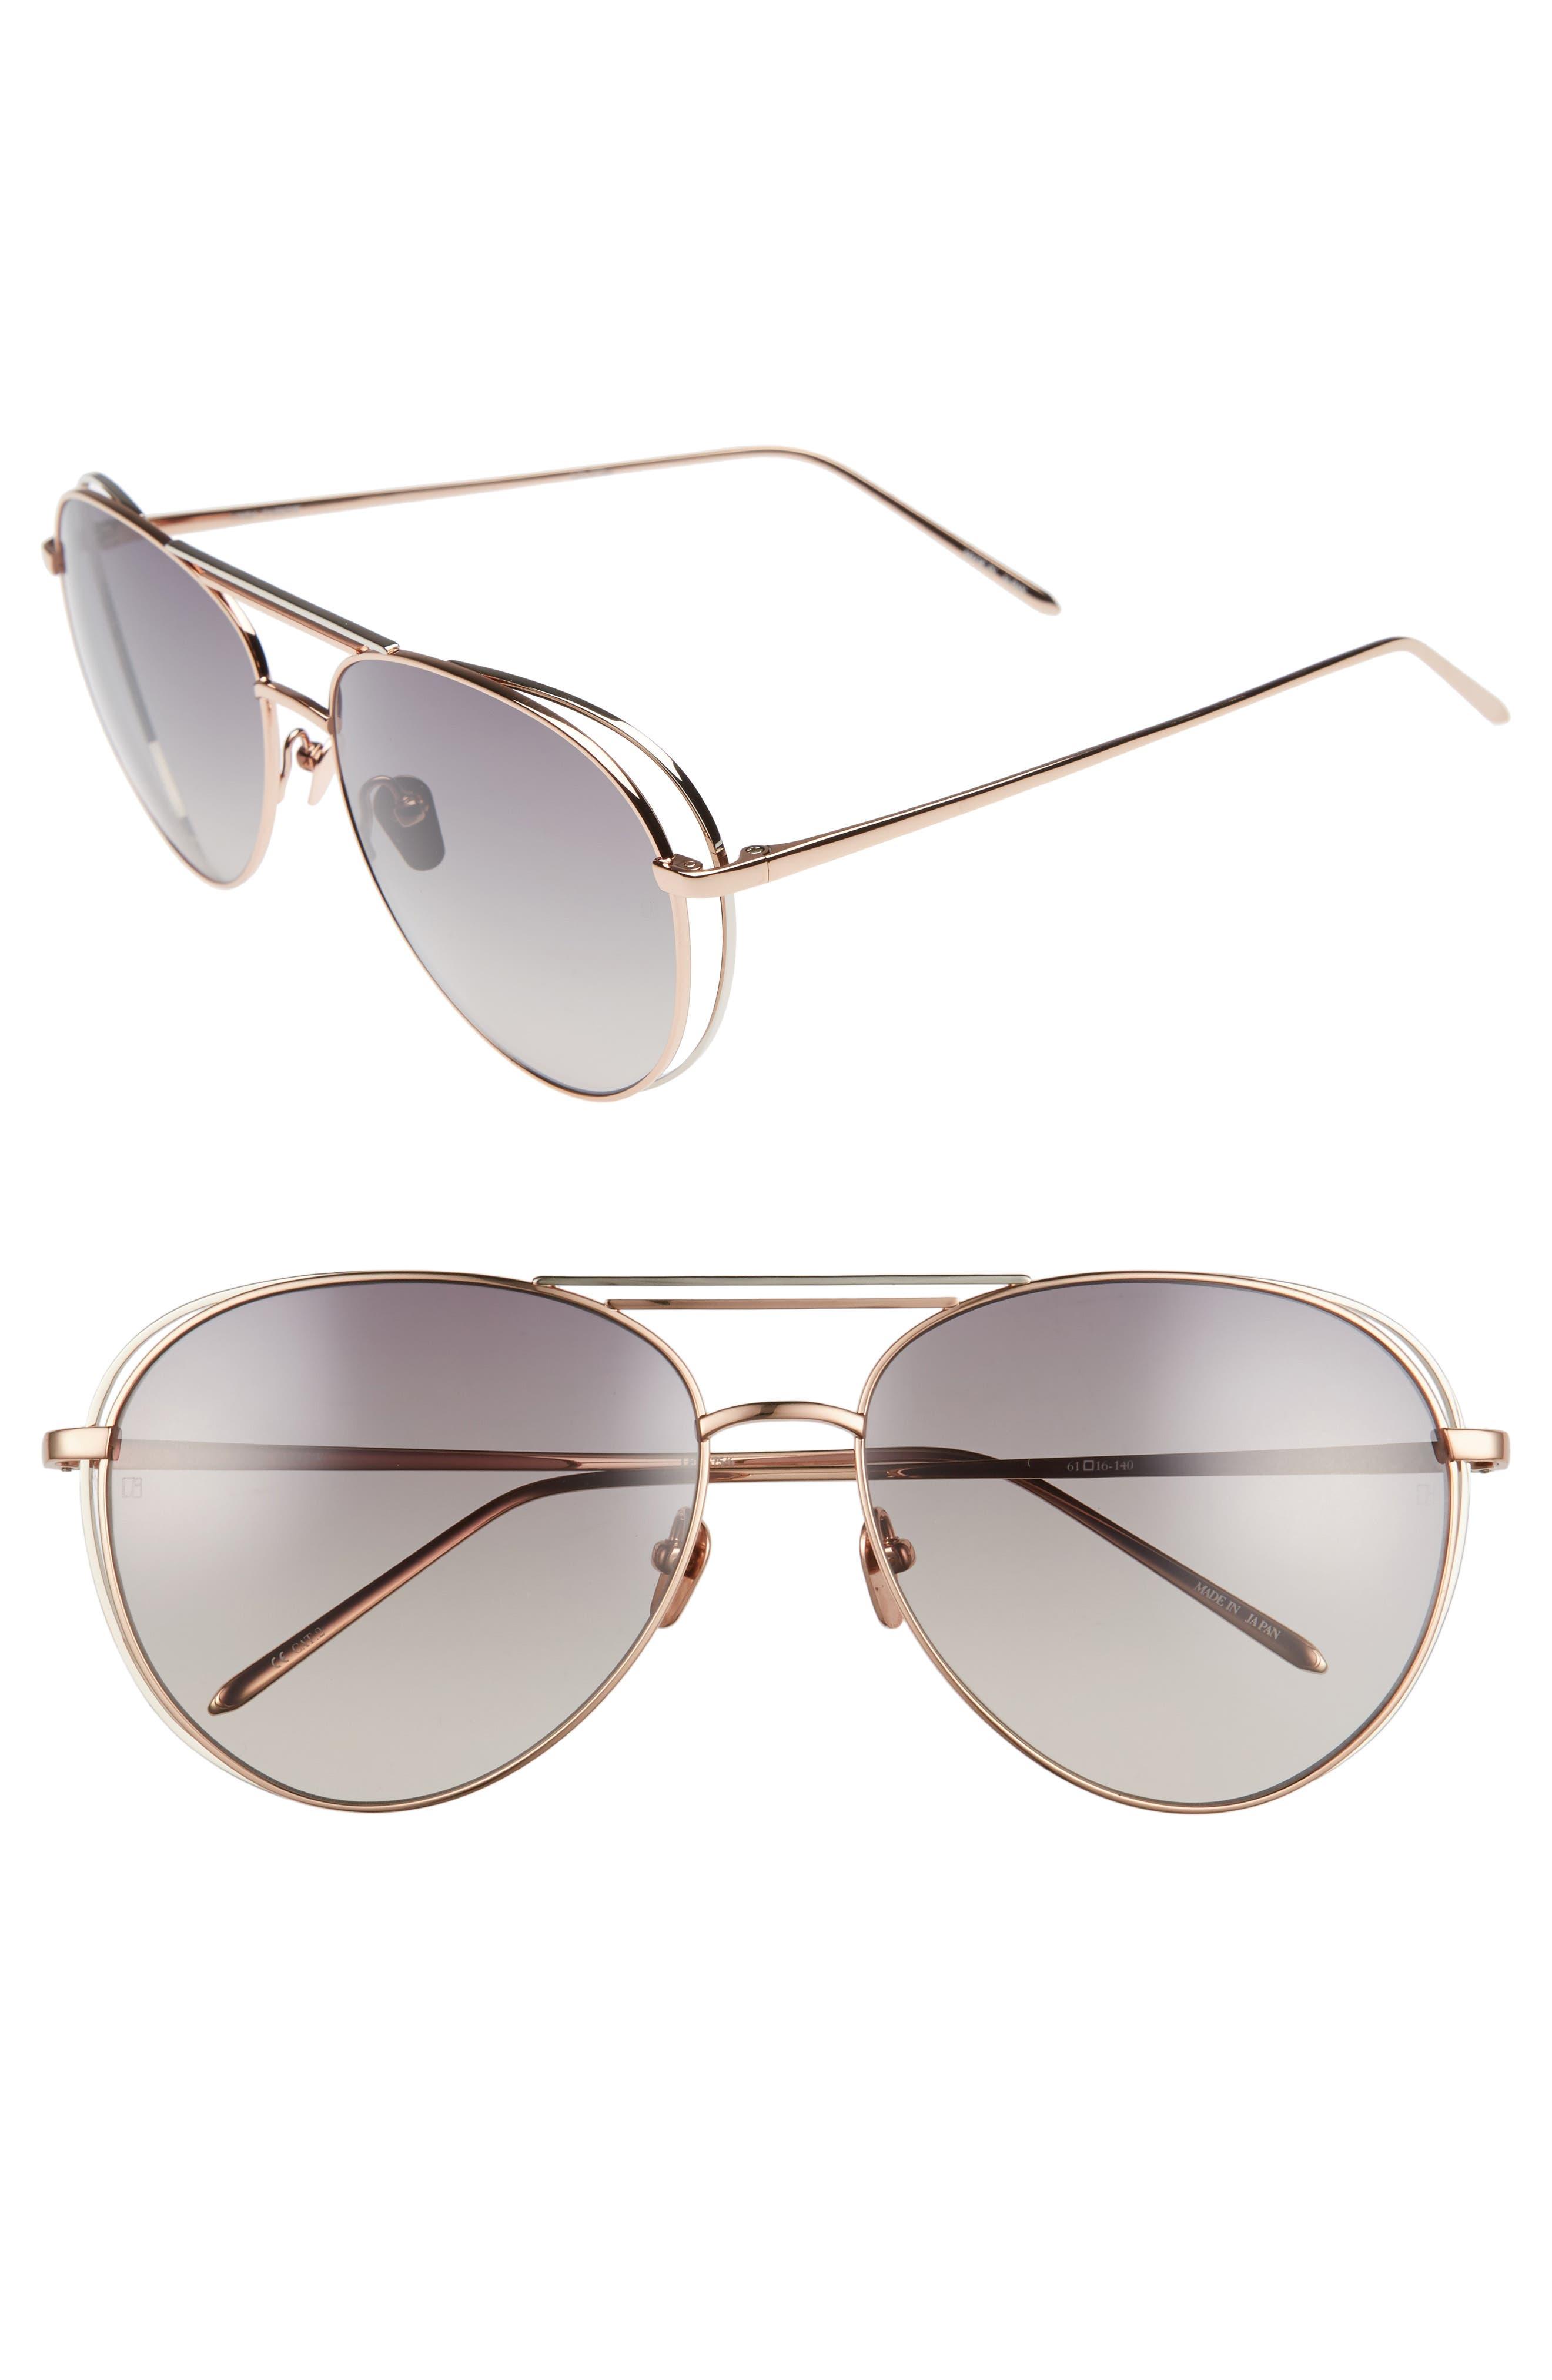 Main Image - Linda Farrow 61mm 18 Karat Gold Aviator Sunglasses